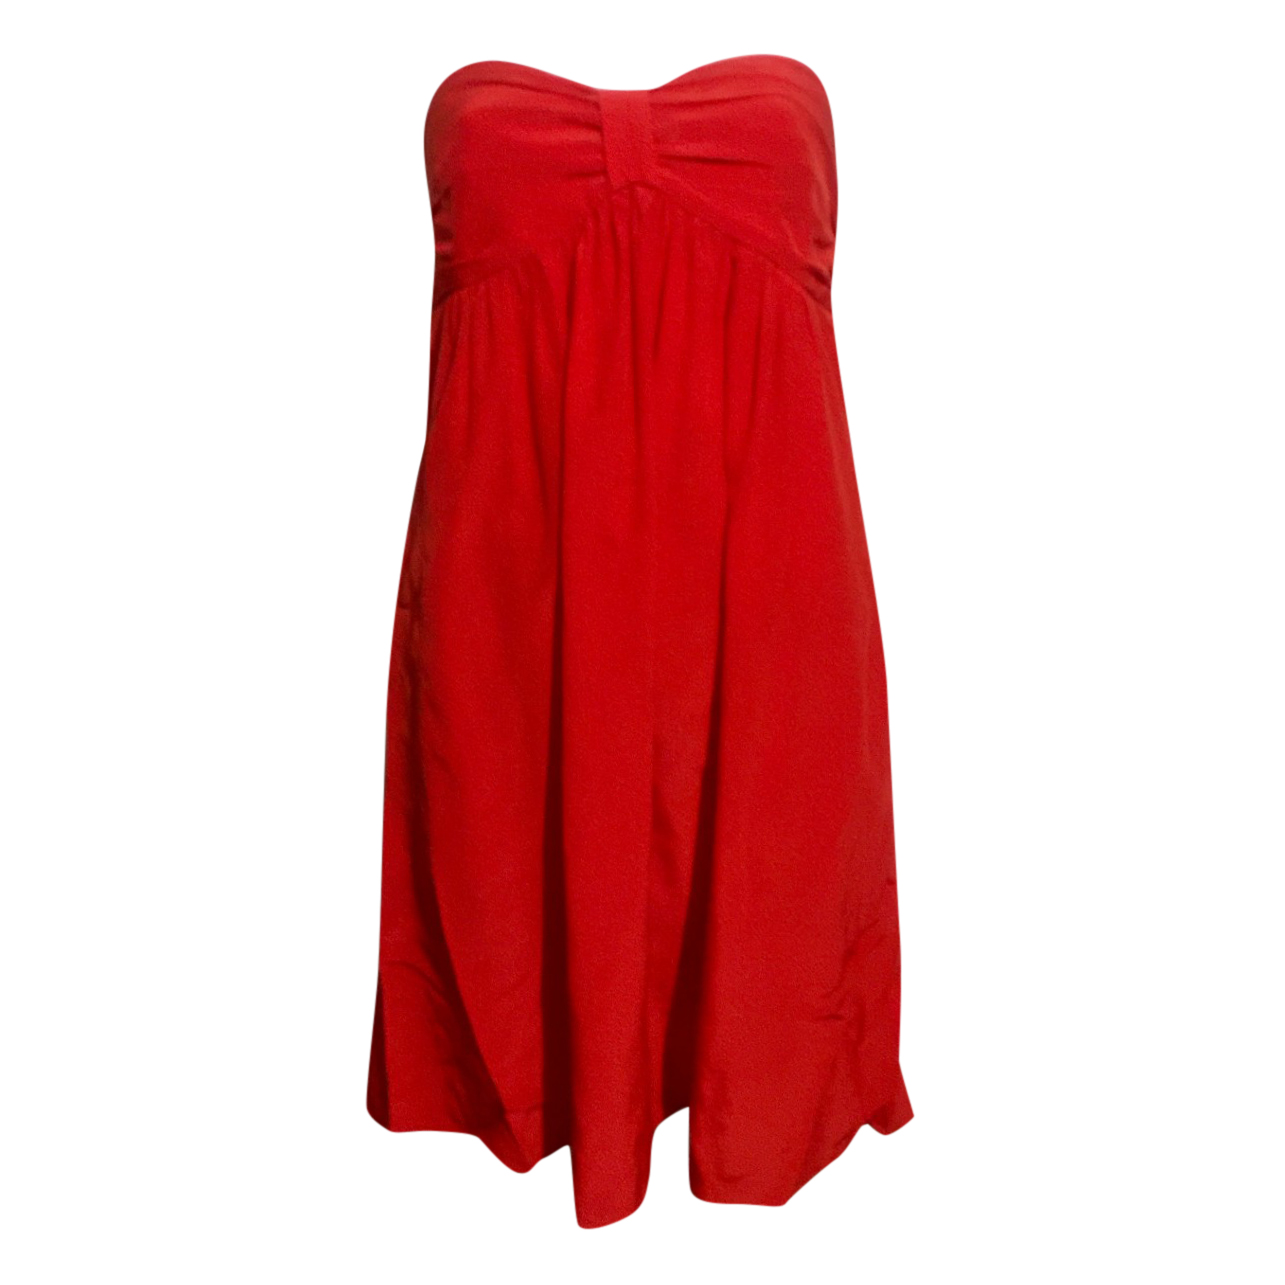 Zimmermann Red Strapless Mini Dress